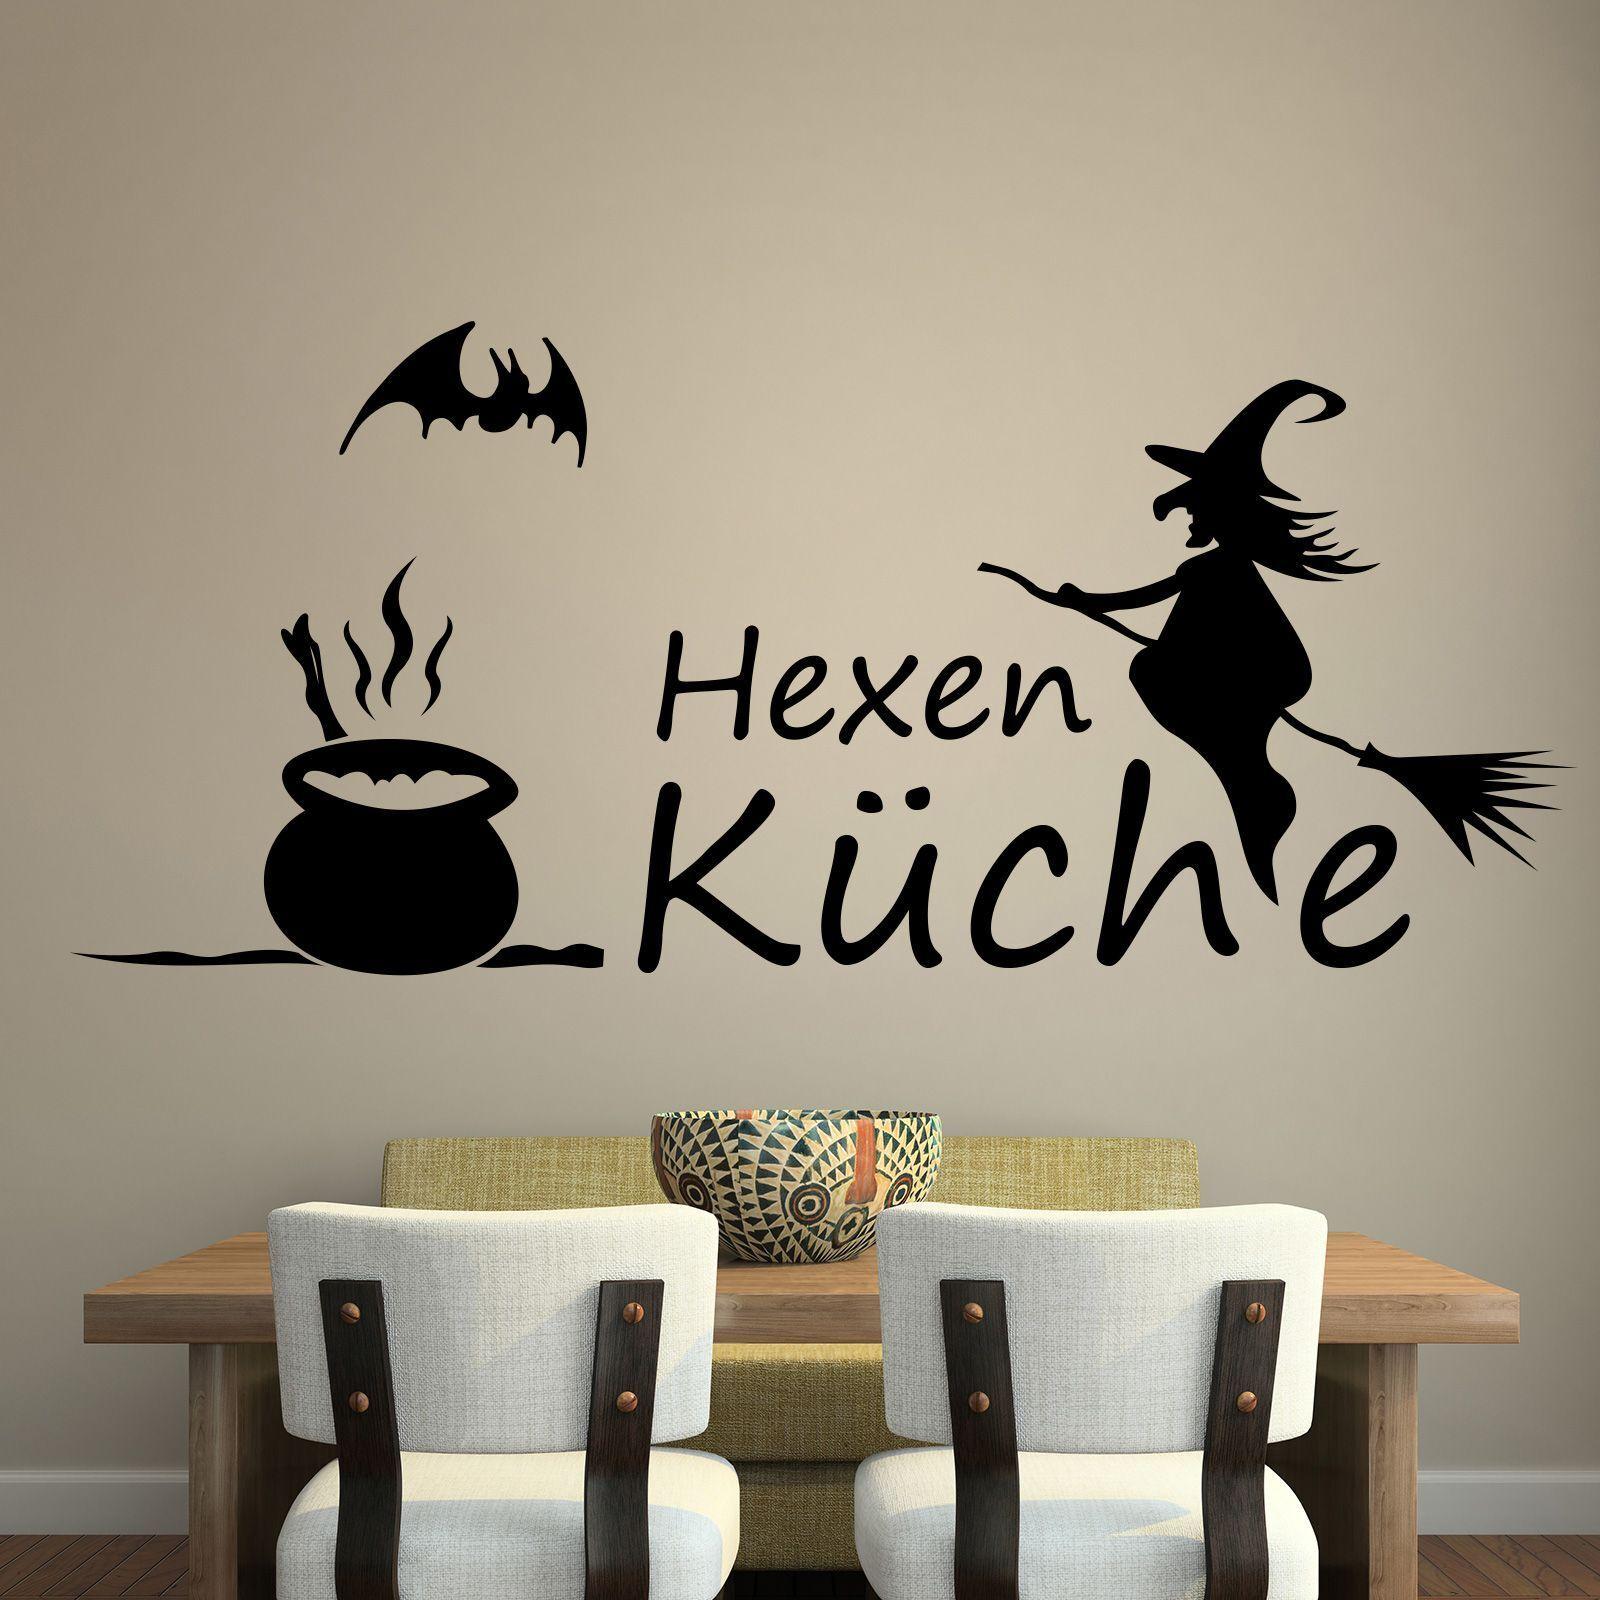 Hexenkuche 3 Kuche Hexen Wandtattoo Spruch Aufkleber Tattoo Folie Children S Bedroom Boy Decor Decals Stickers Vinyl Art Home Decor